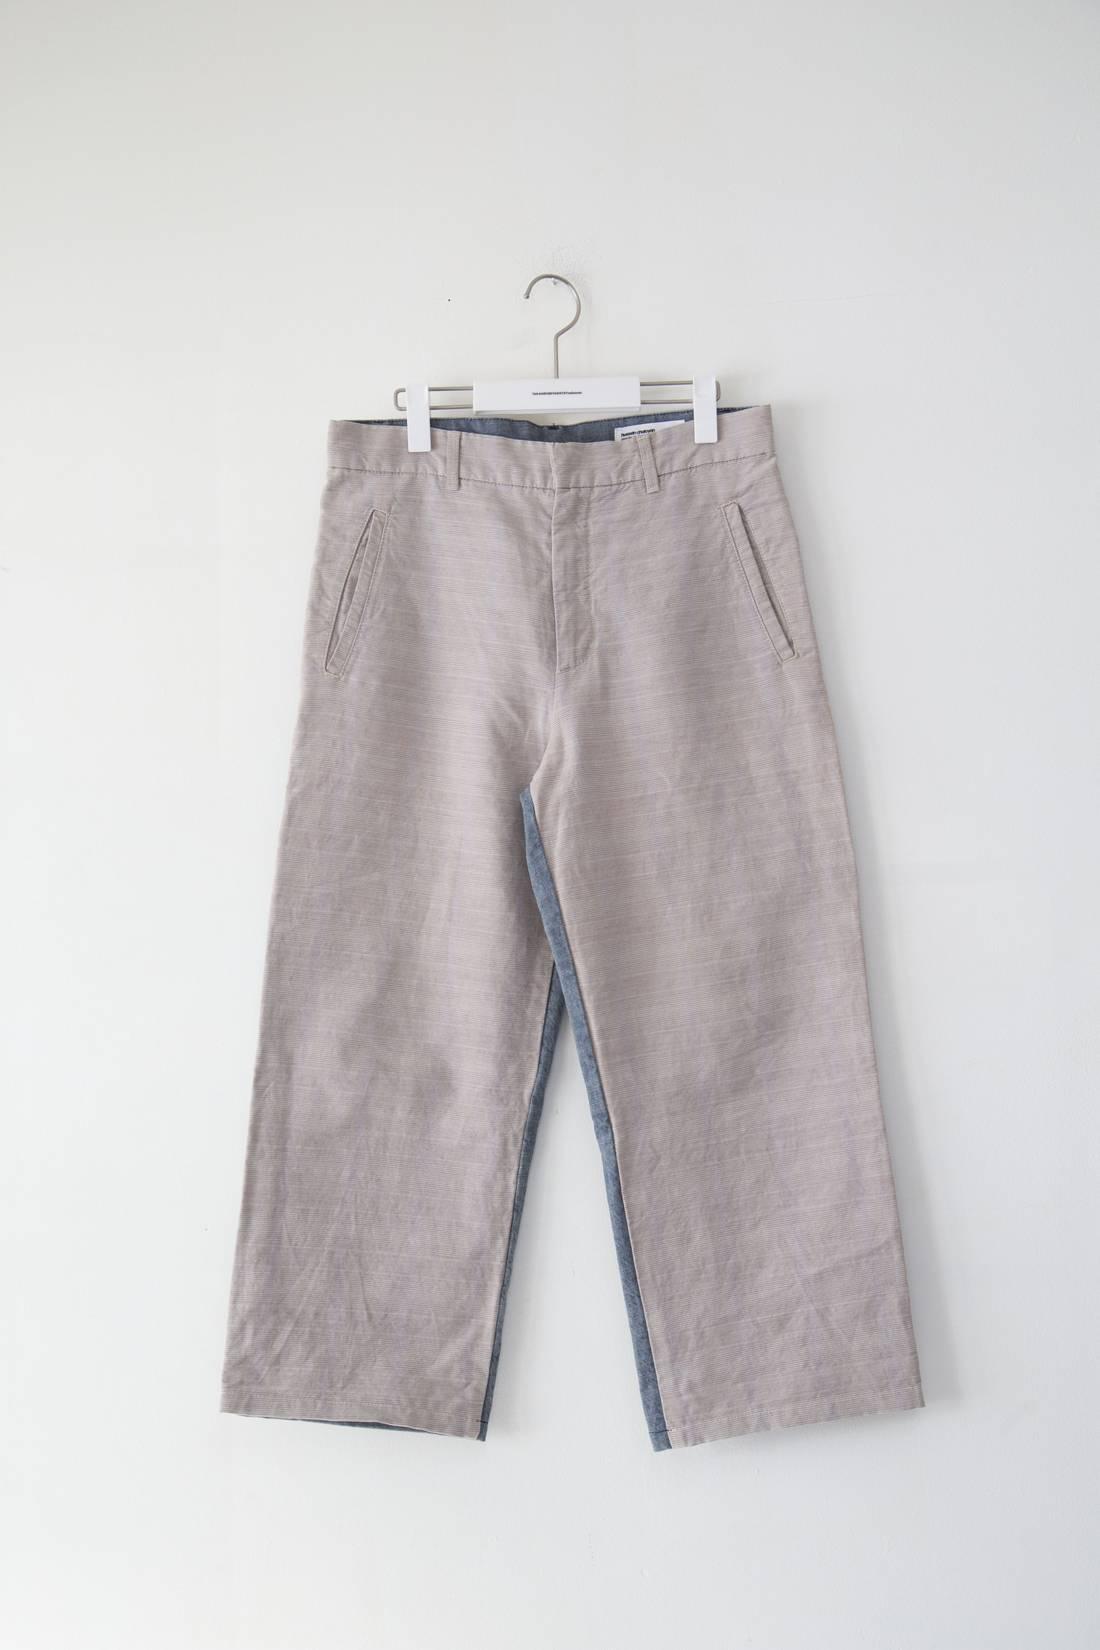 TROUSERS - Bermuda shorts Hussein Chalayan